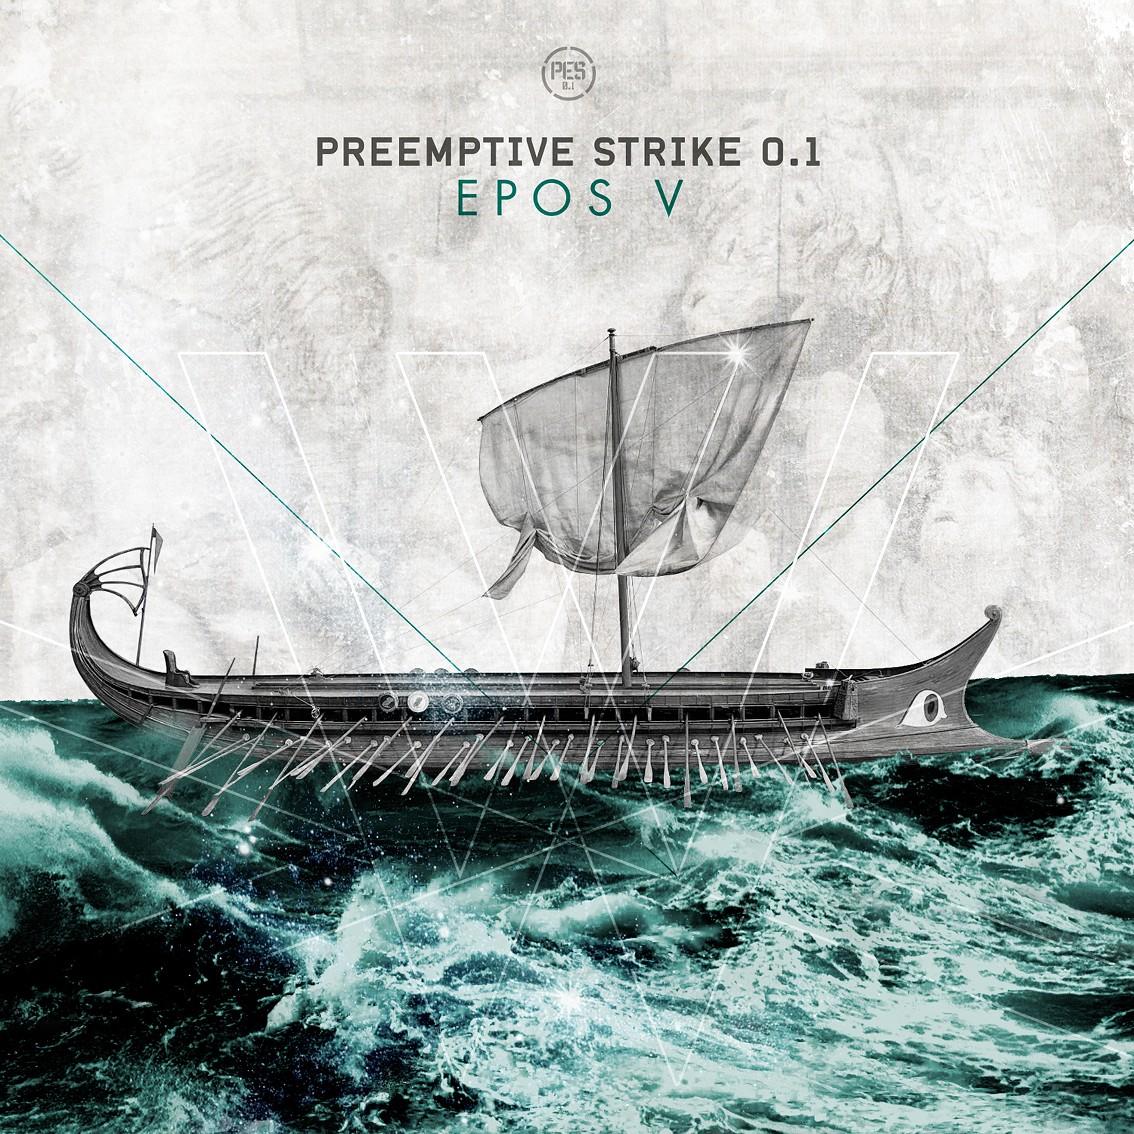 PreEmptive Strike 0.1 returns to electro roots on 'Epos V'